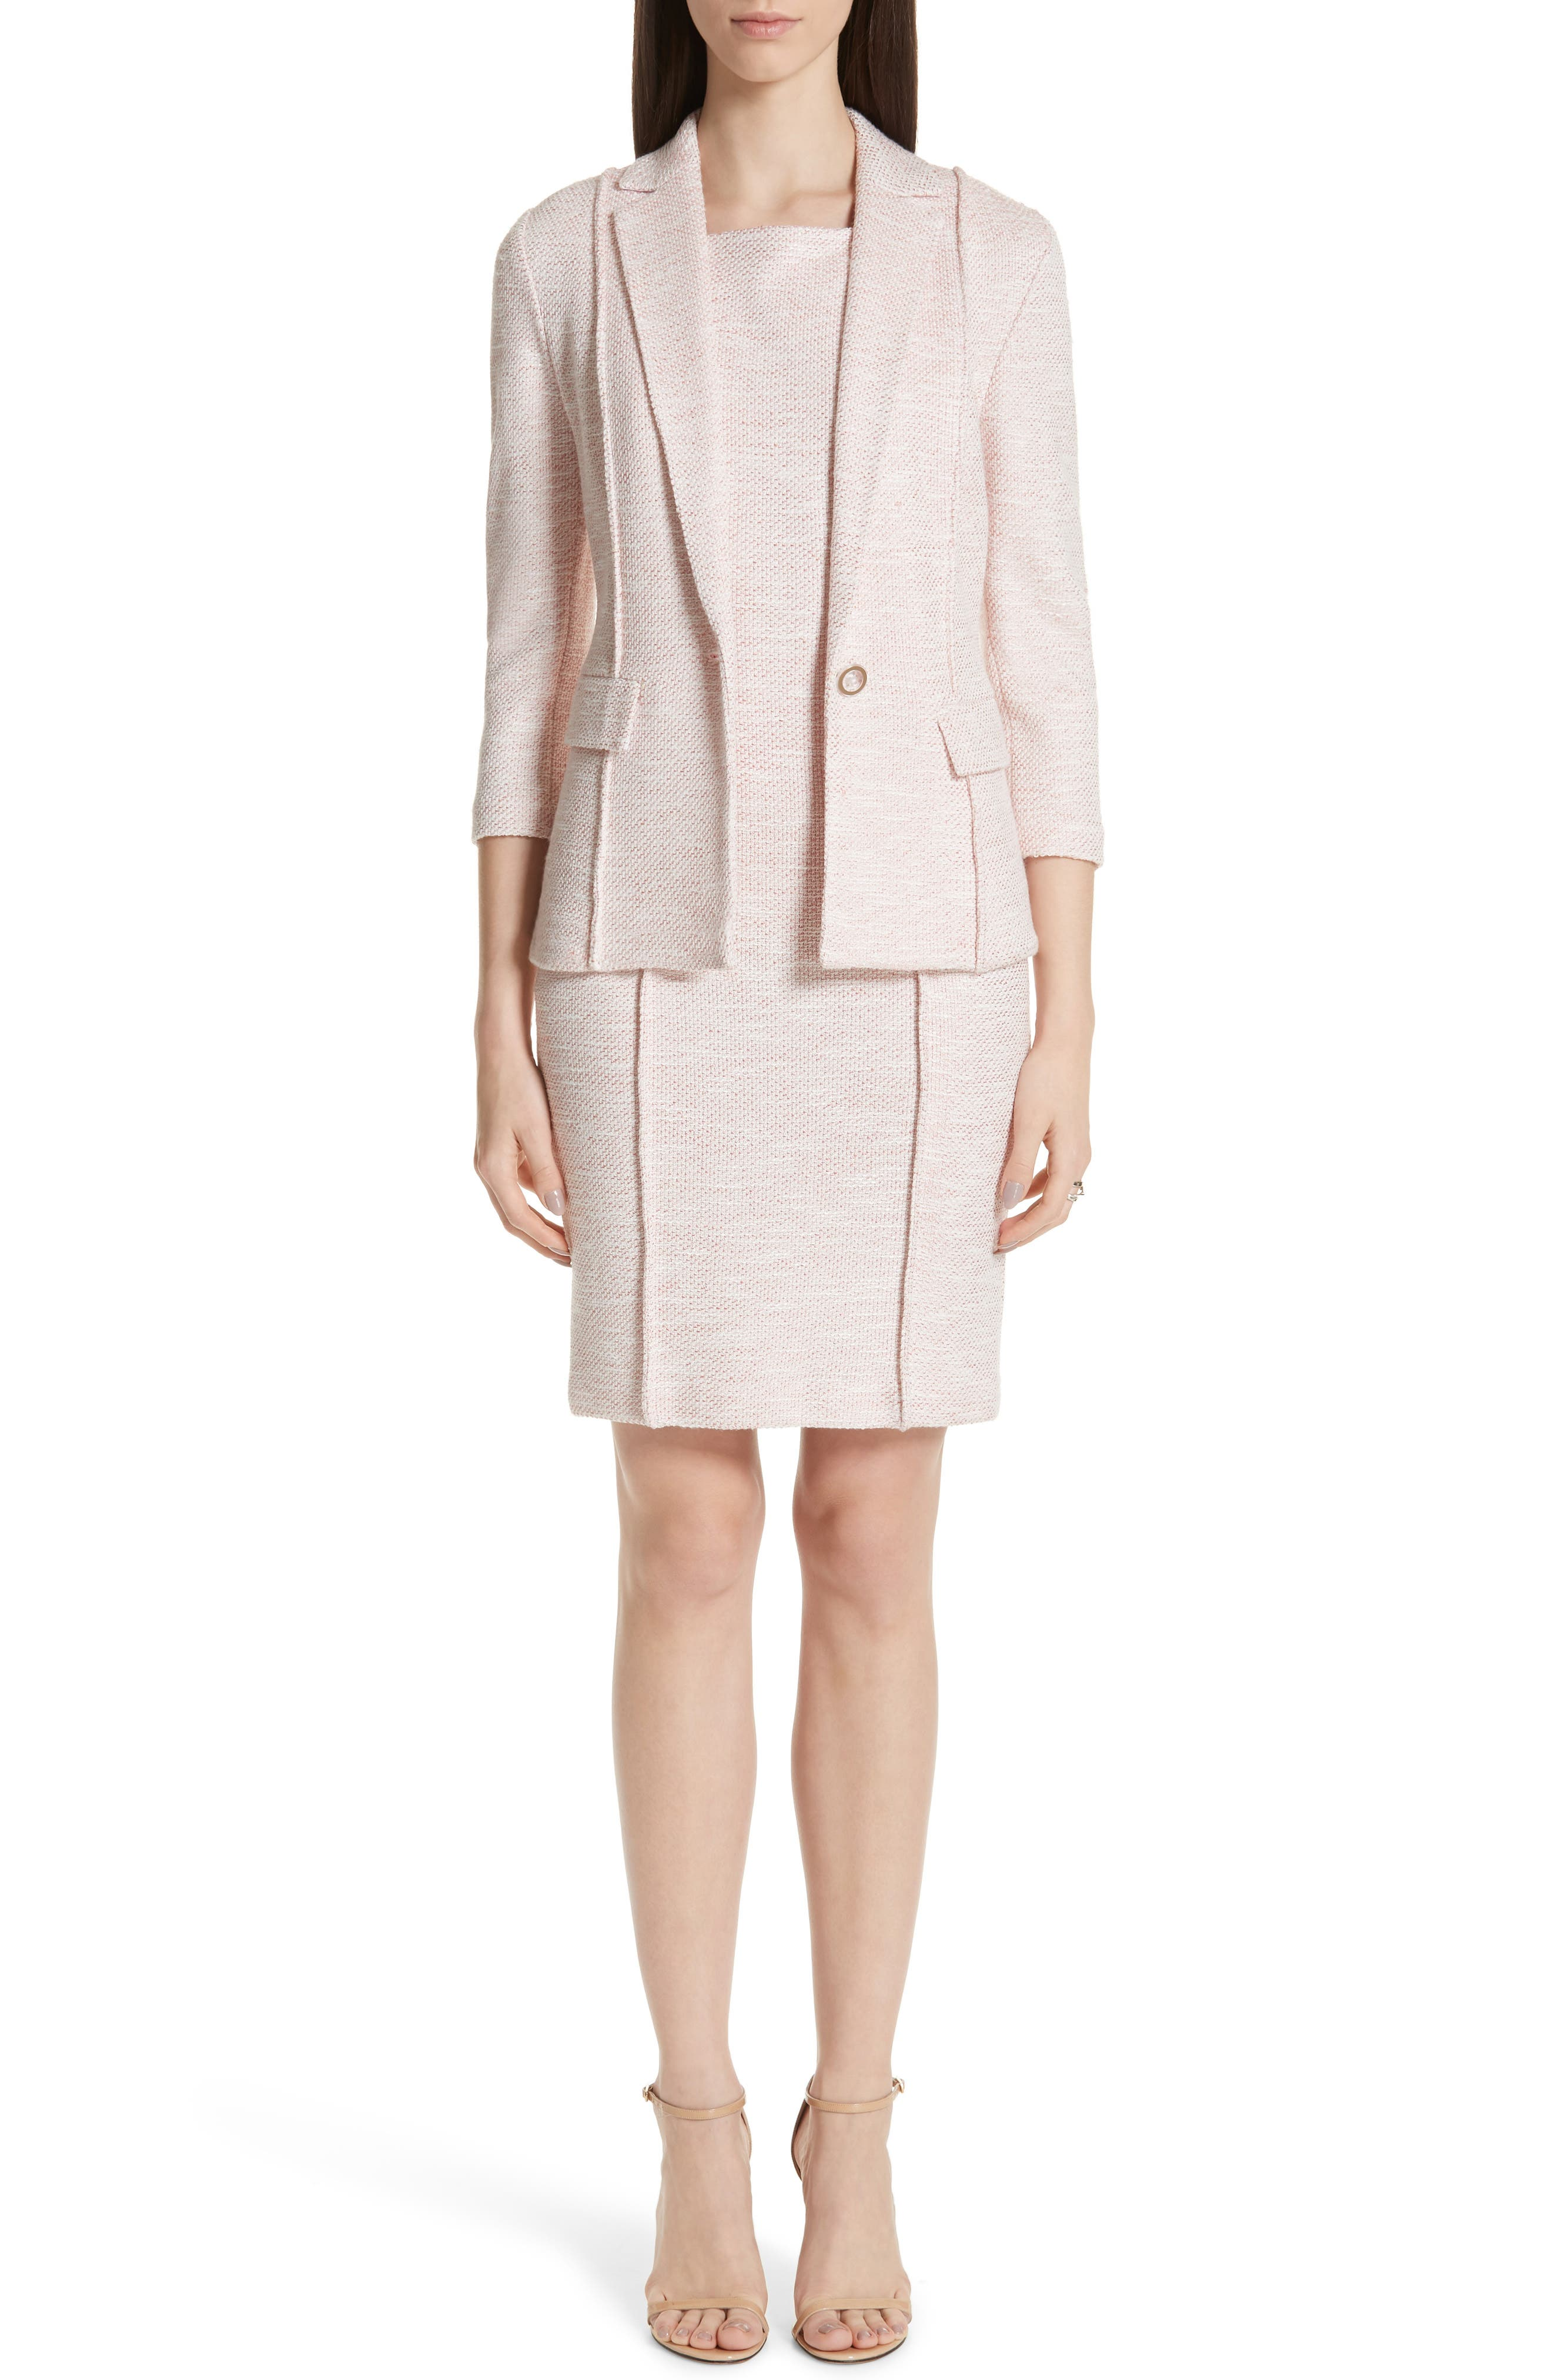 ST. JOHN COLLECTION, Belinda Knit Square Neck Dress, Alternate thumbnail 7, color, WHITE/ CORAL MULTI